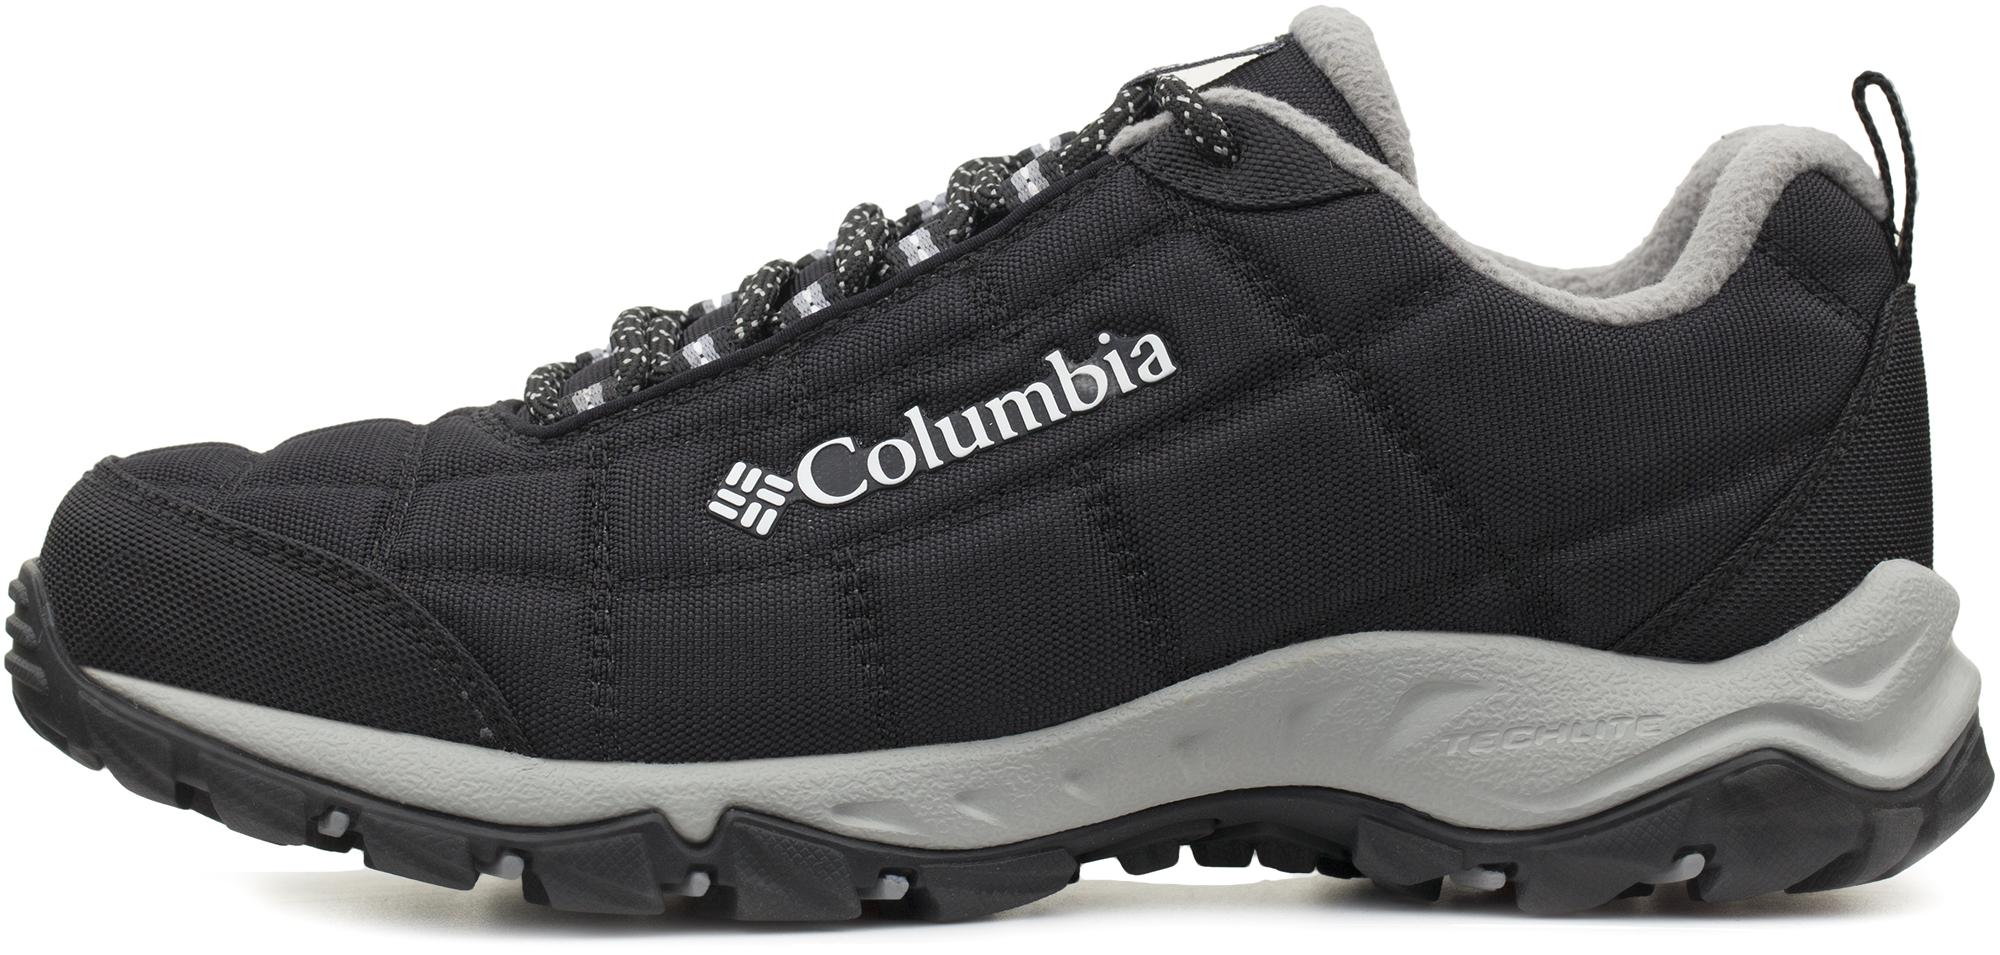 Columbia Ботинки женские Firecamp, размер 41